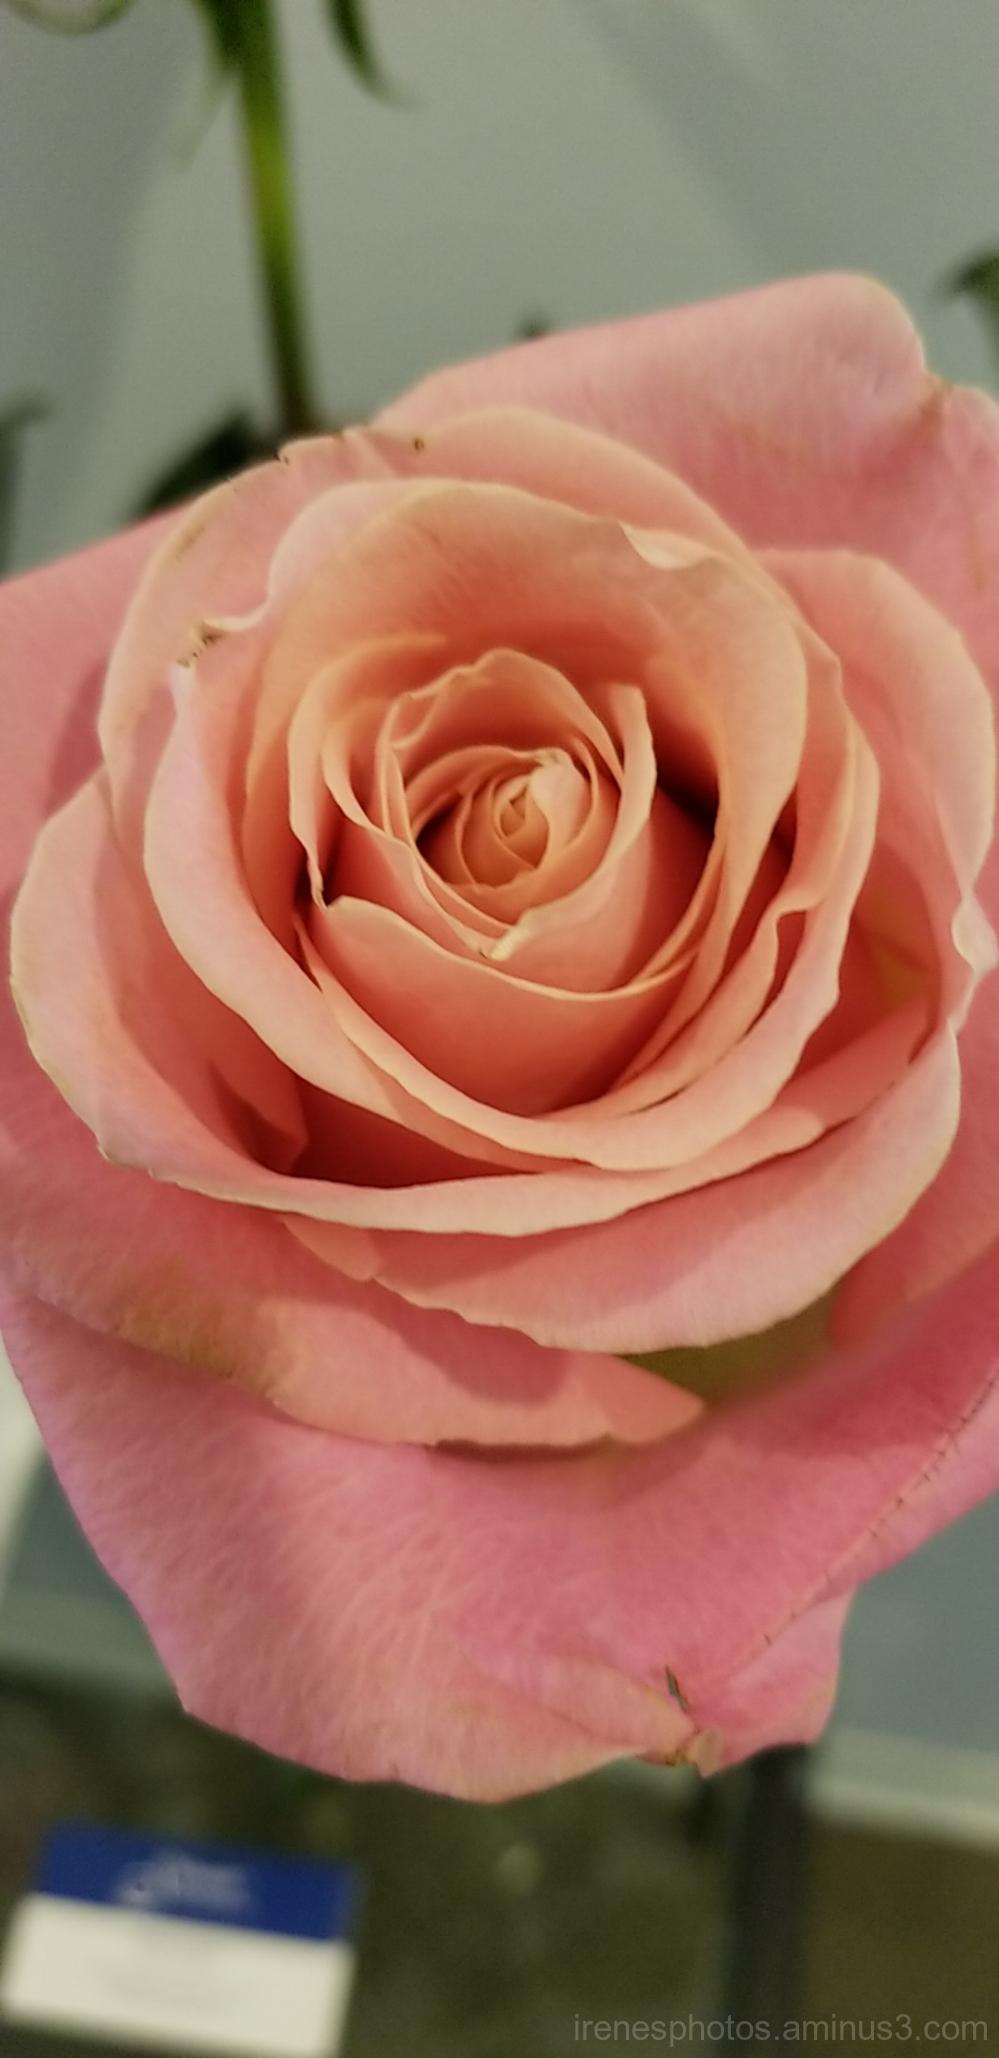 Rose on 05.01.2018